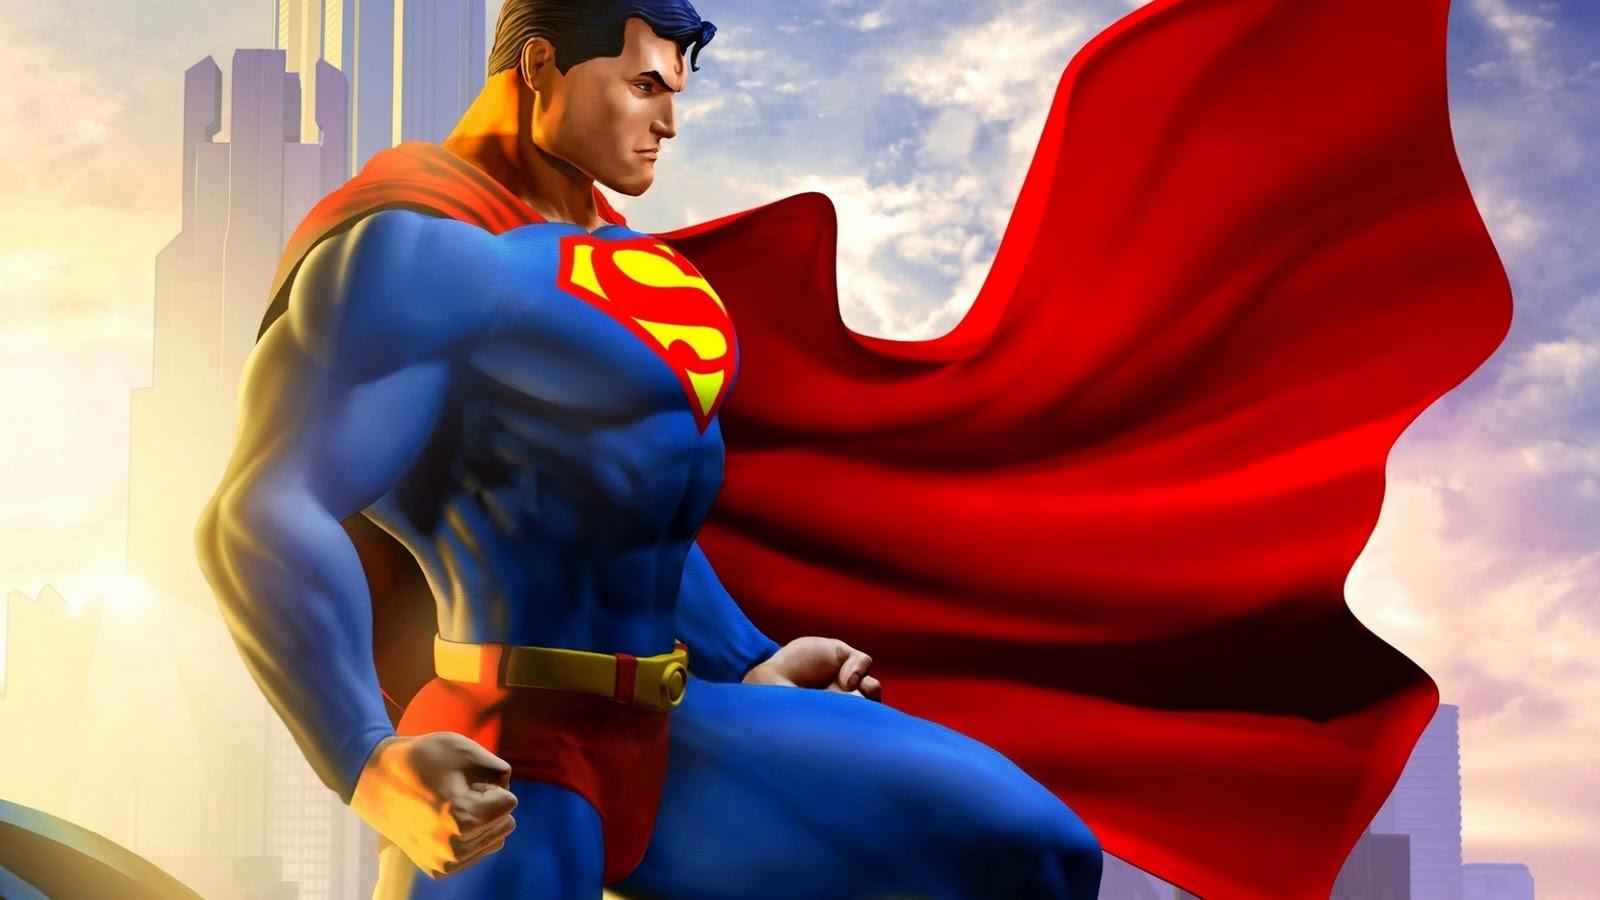 Hd Wallpaper Superman Download Wallpaper DaWallpaperz 1600x900